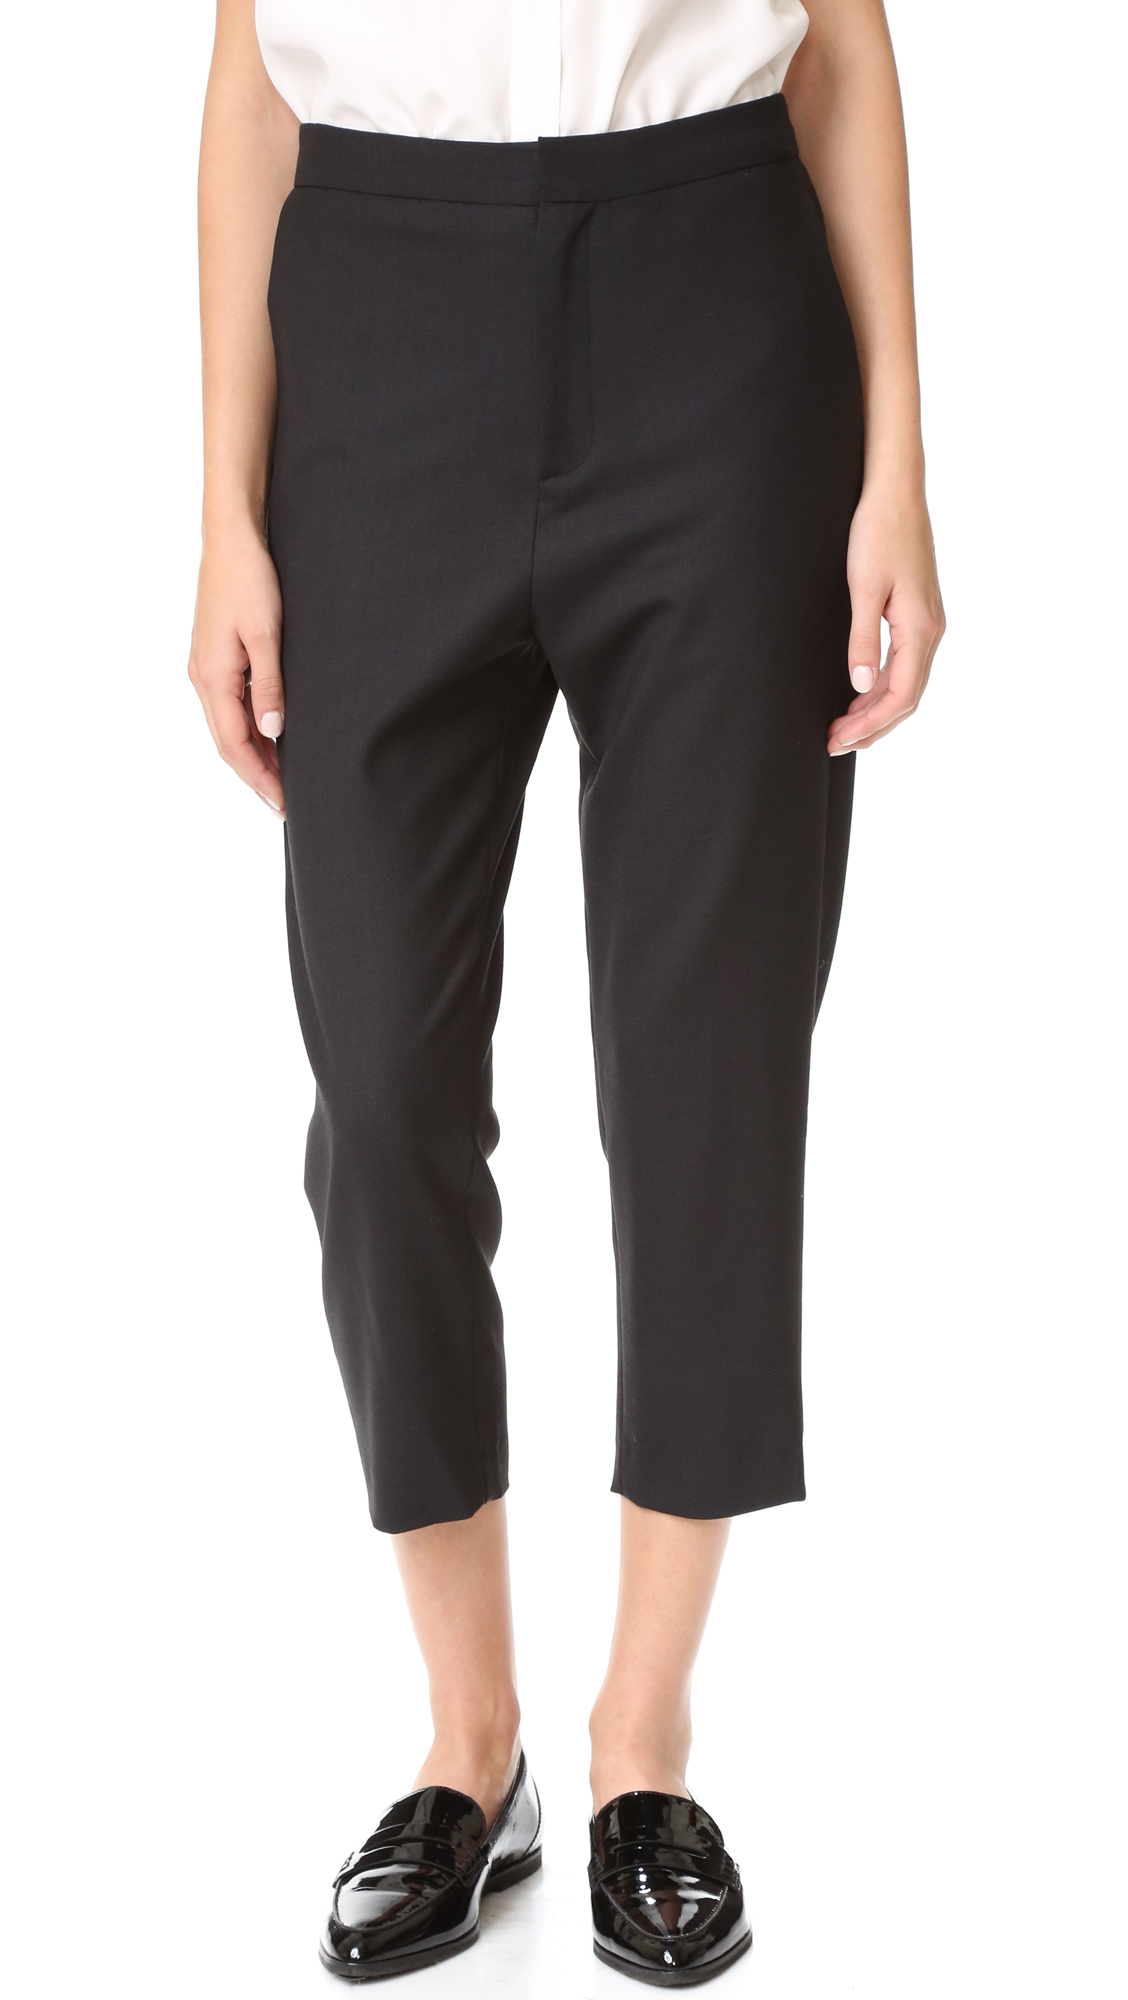 Superfine Secret Tailored Pants in Black